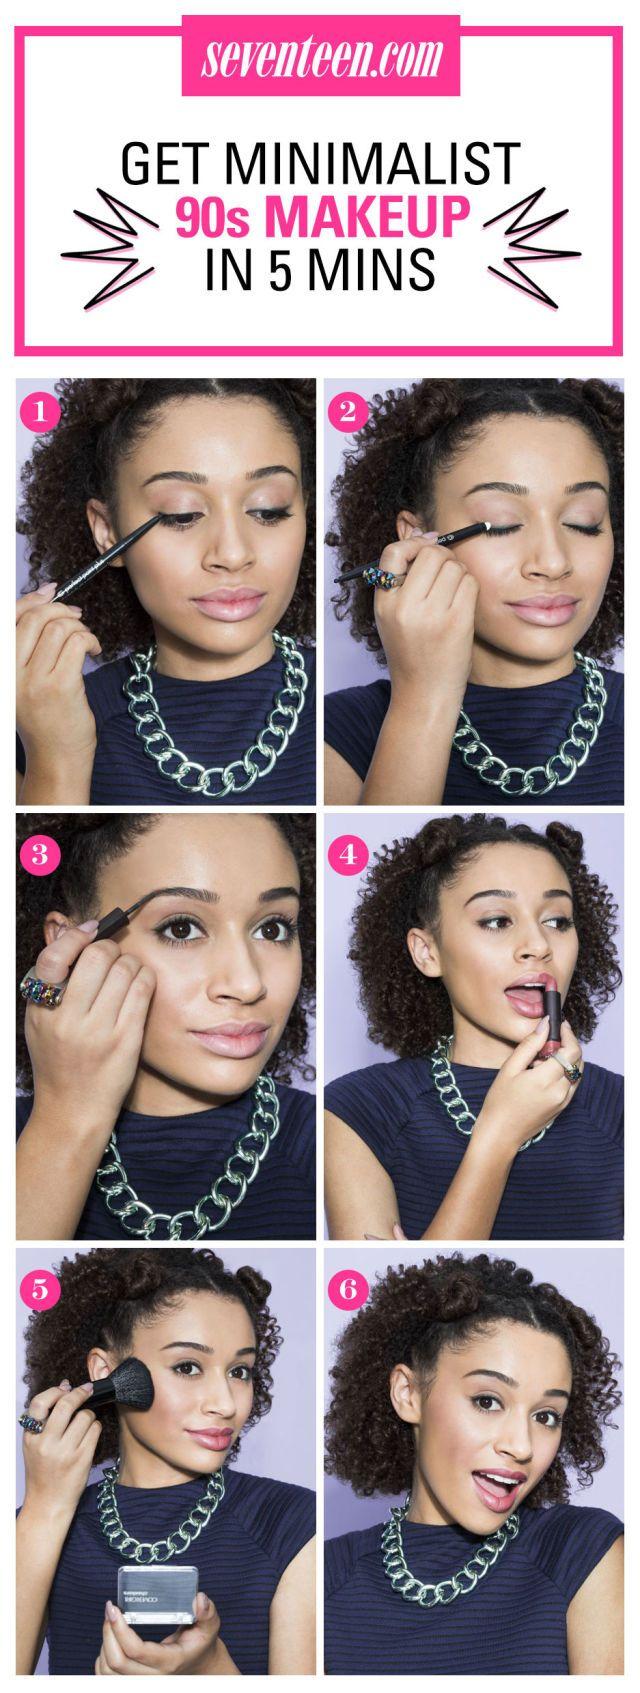 Get a Chic, Minimalist '90s Makeup Look in Just 5 Minutes!  - Seventeen.com